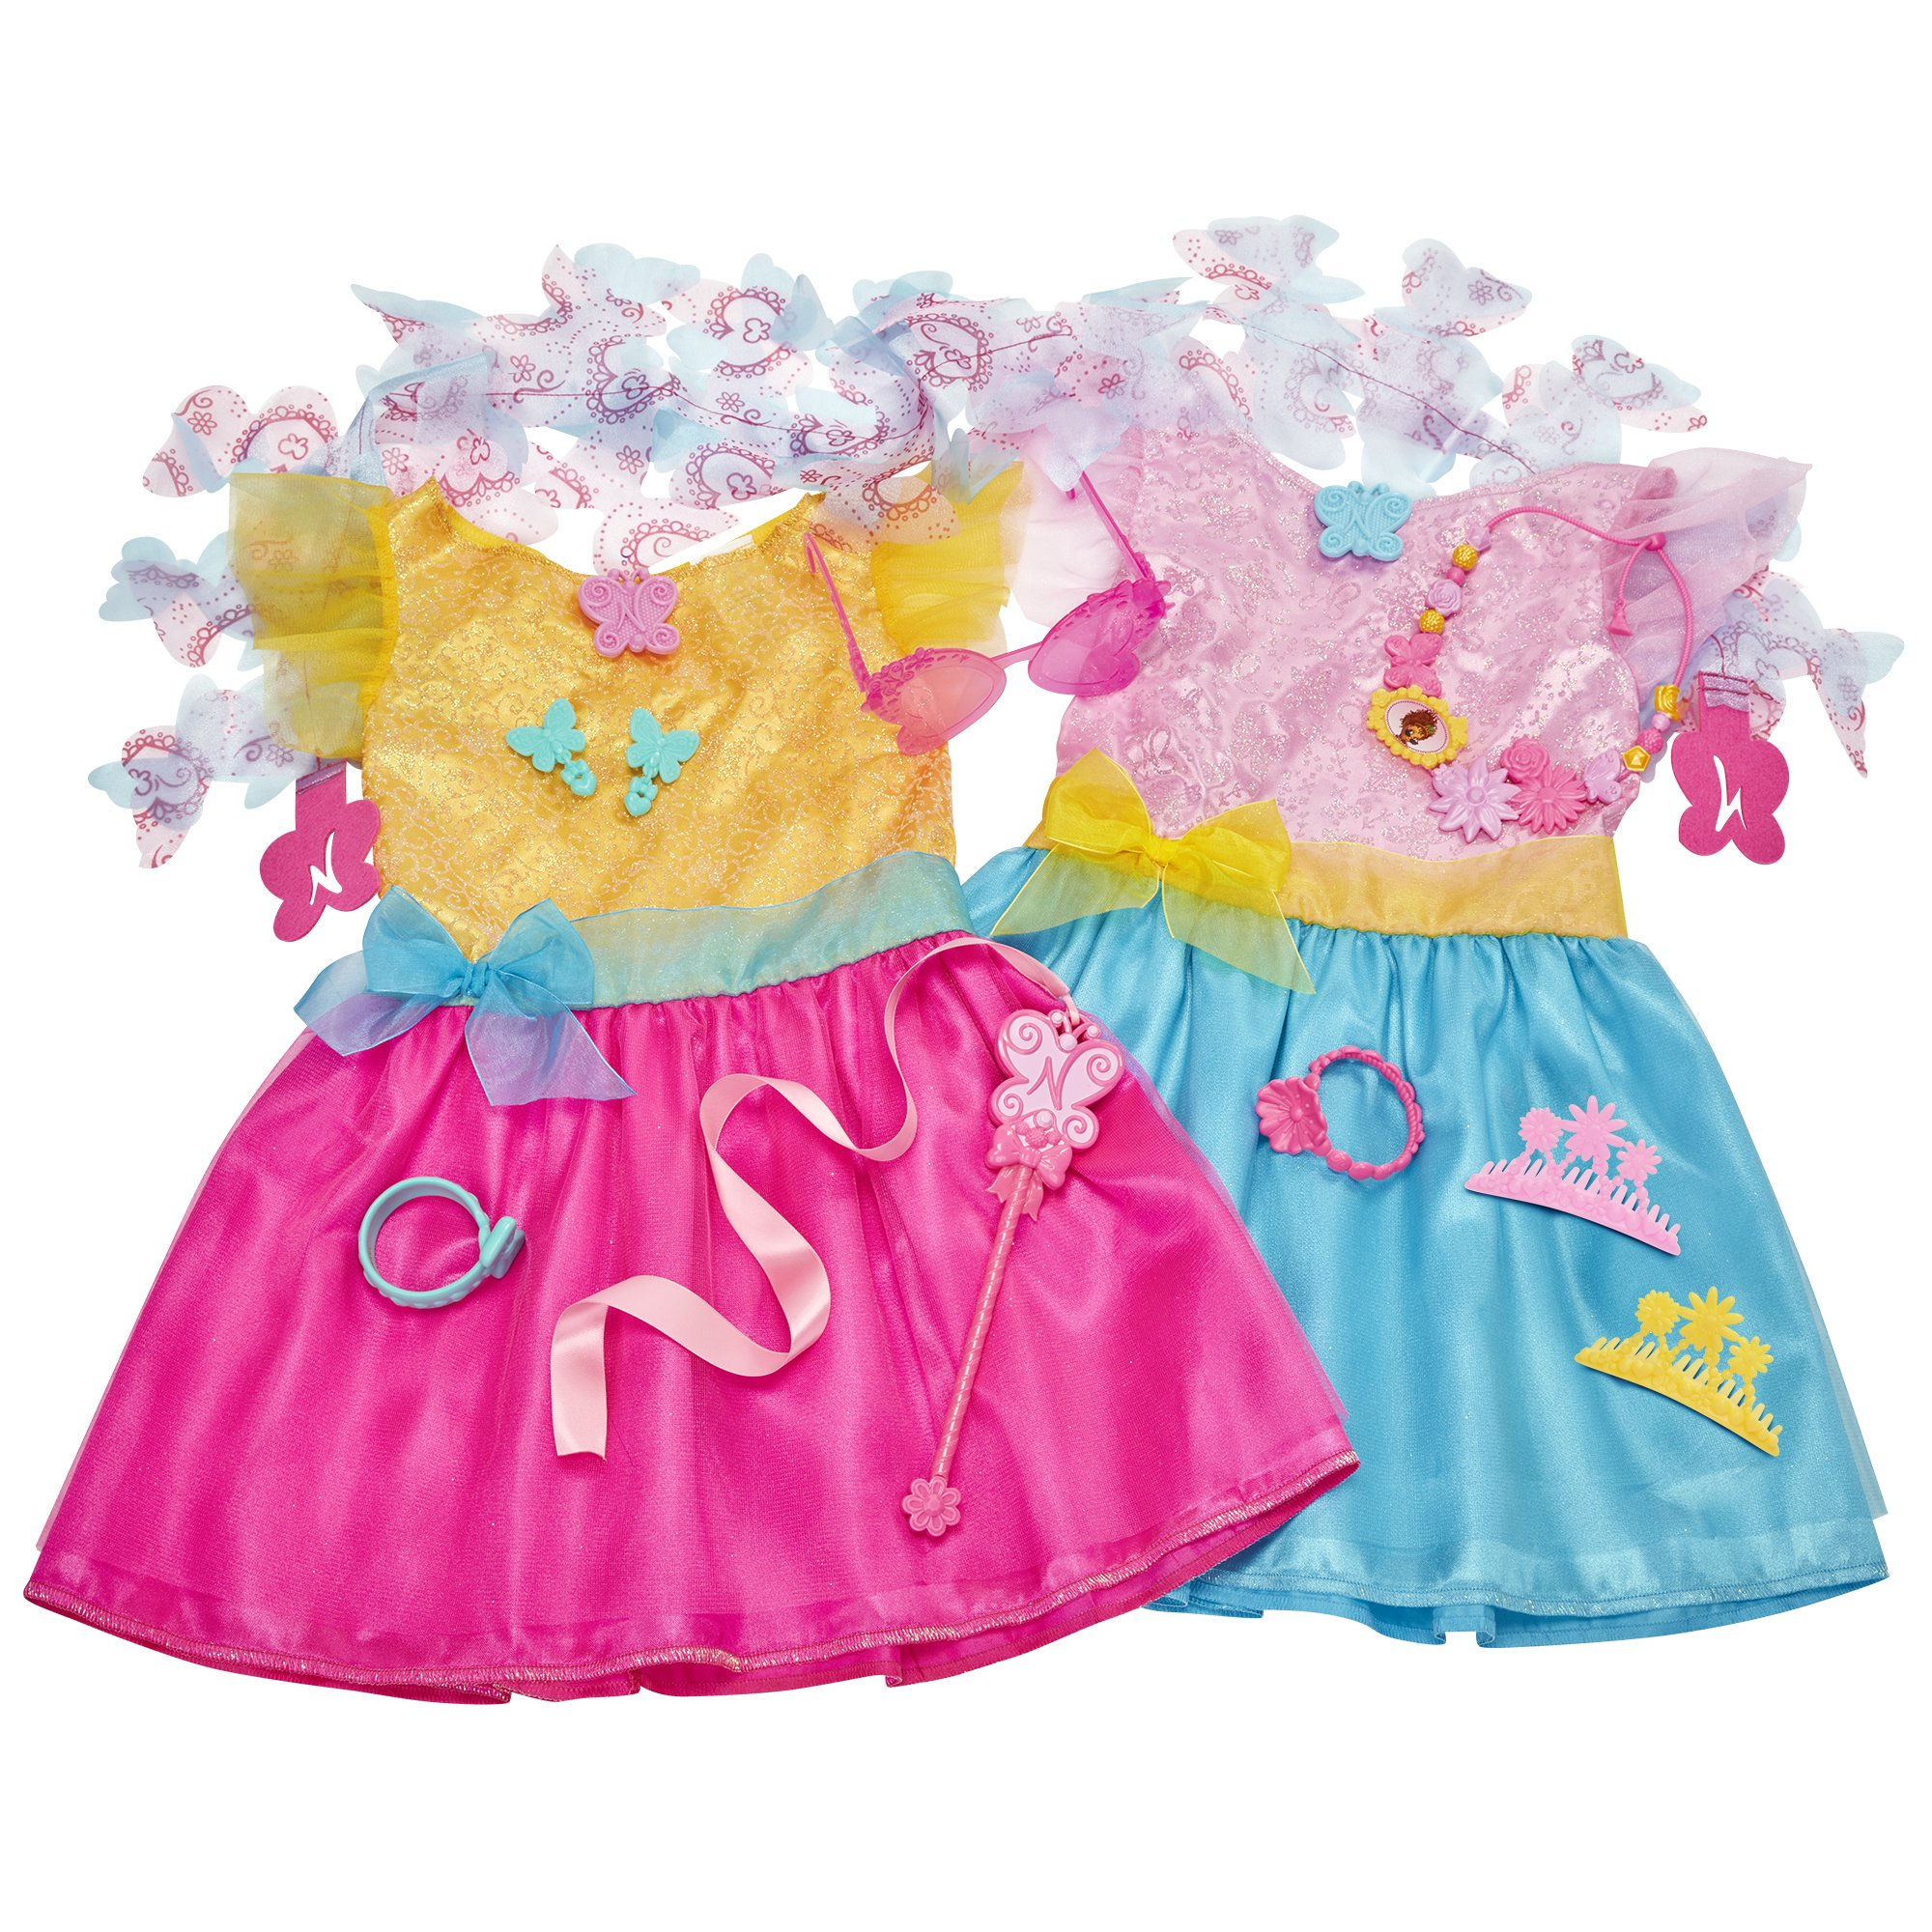 Fancy Nancy Ultimate Dress-Up Trunk, 13-Pieces, Fits Sizes 4-6X [Amazon Exclusive] by Fancy Nancy (Image #2)